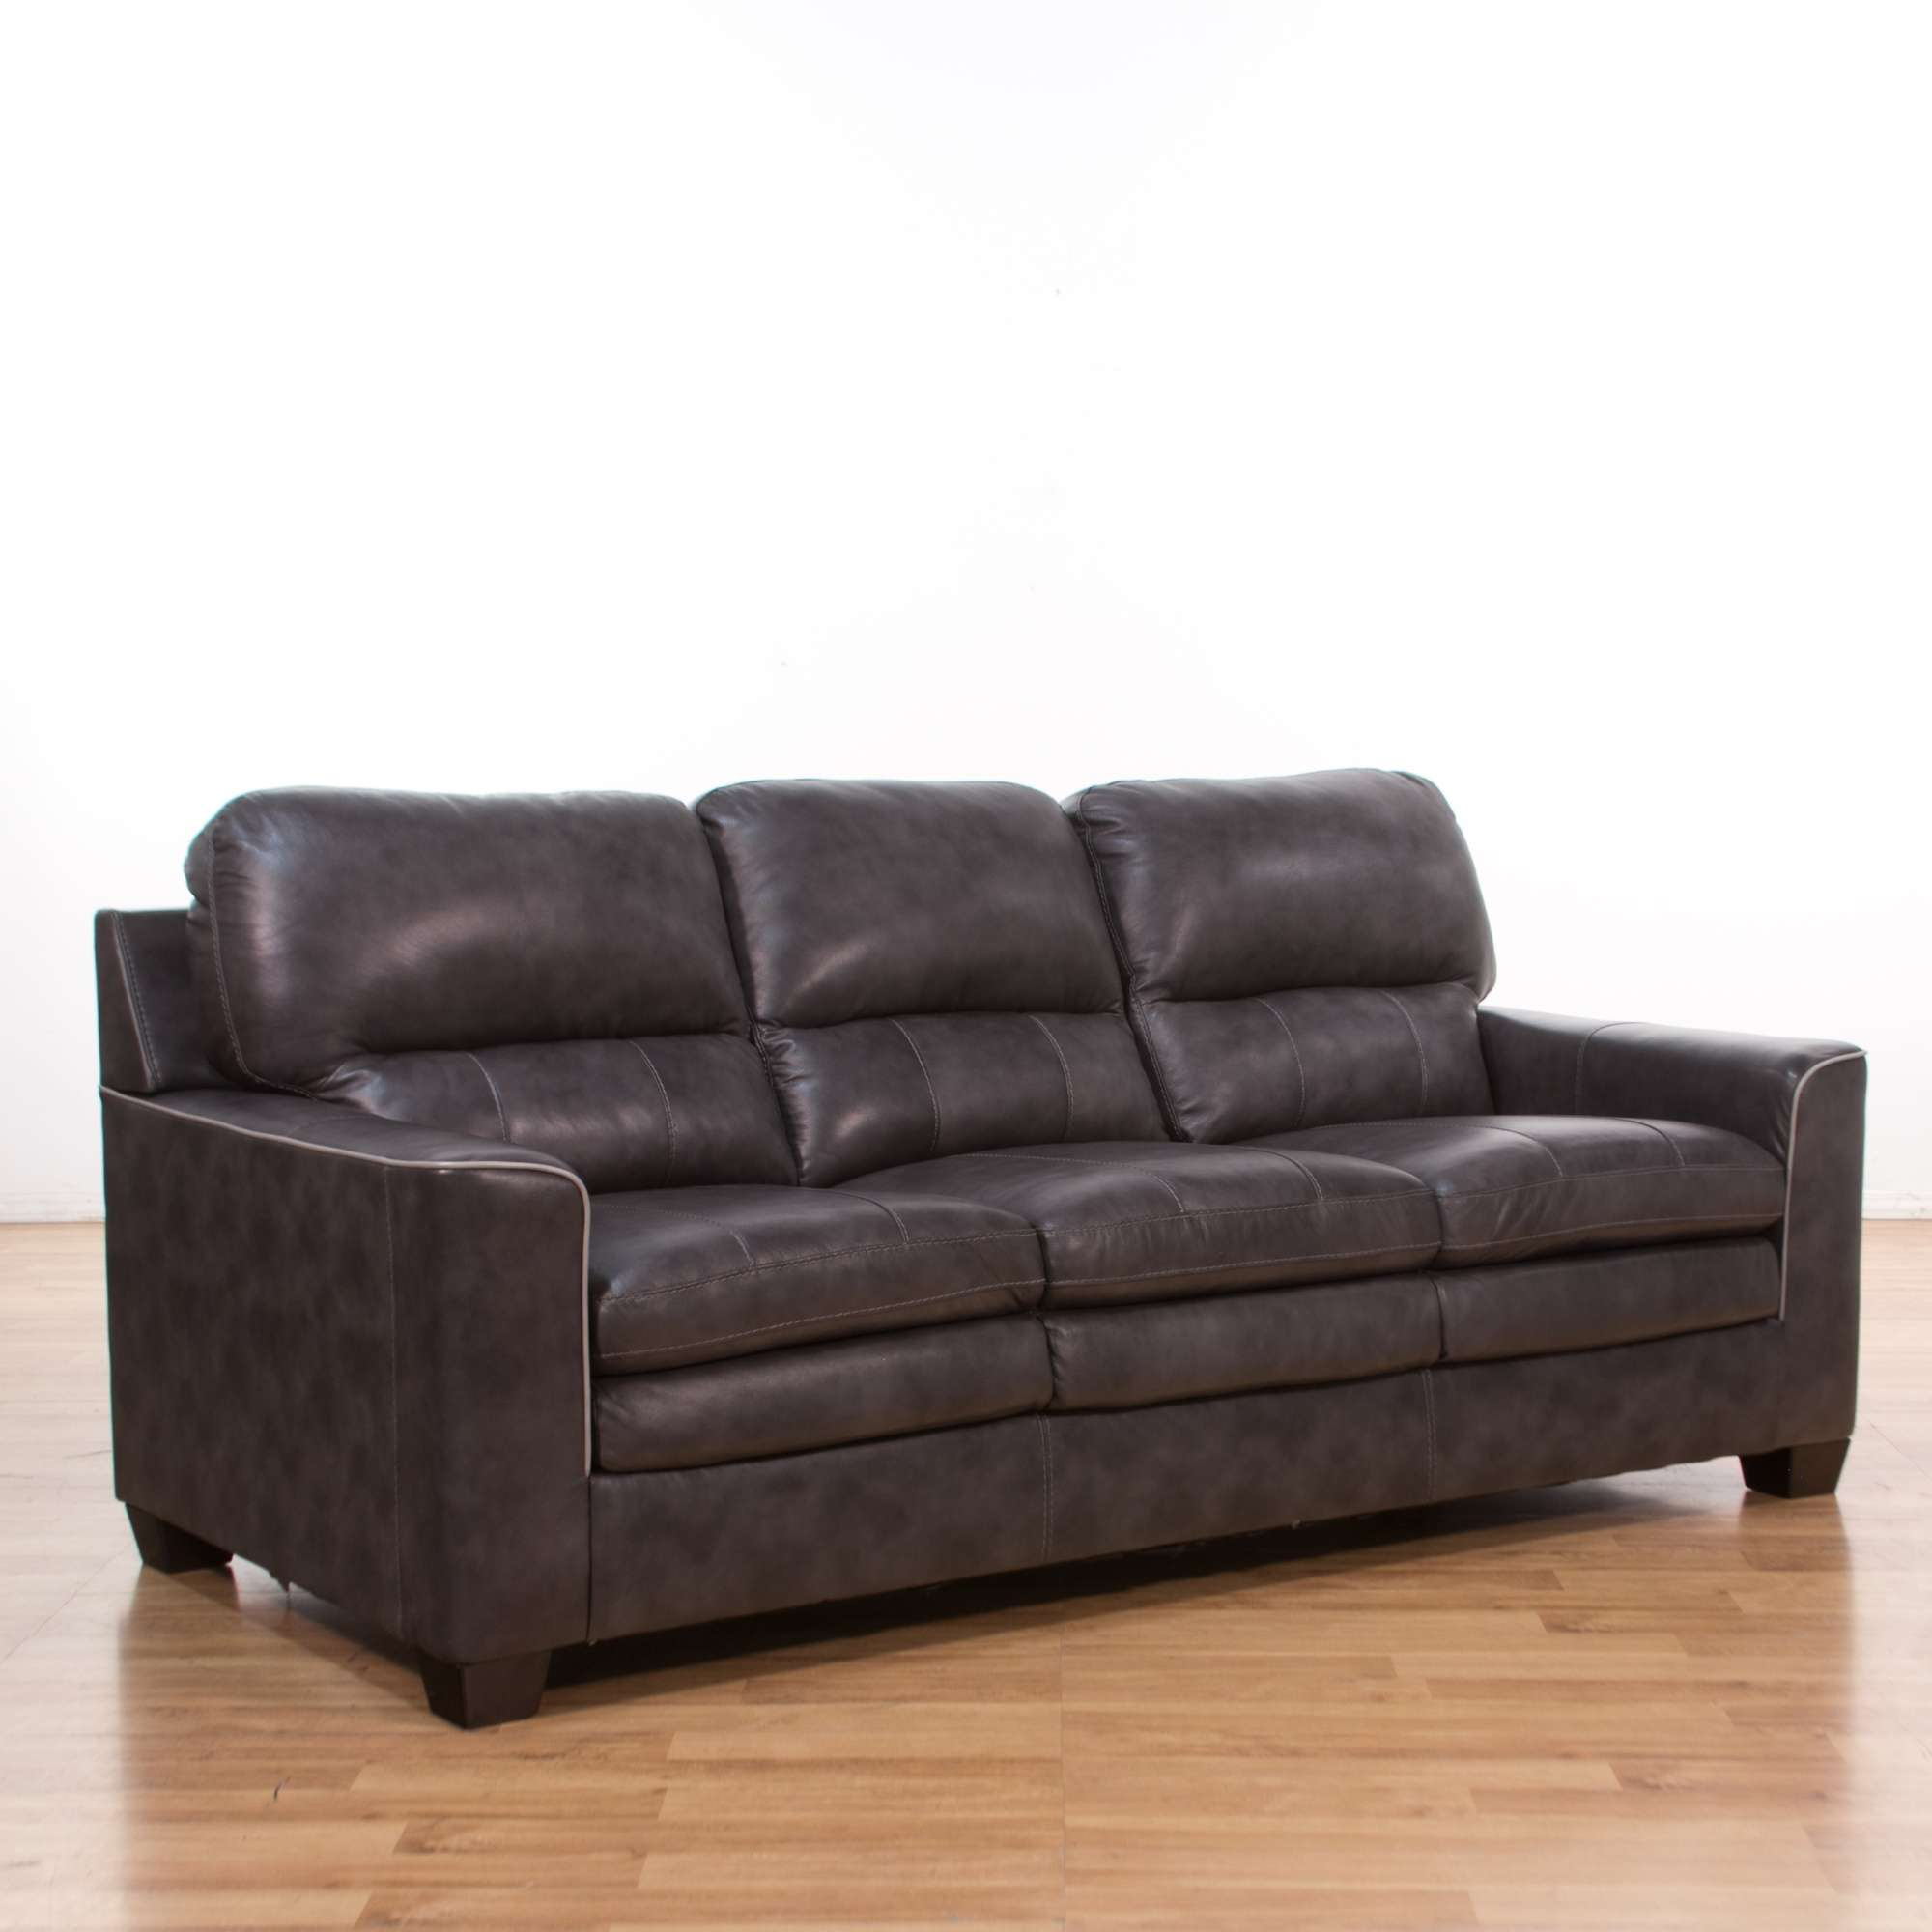 Modern Grey Leather Sofa W/ Piping Detail | Loveseat Vintage ...